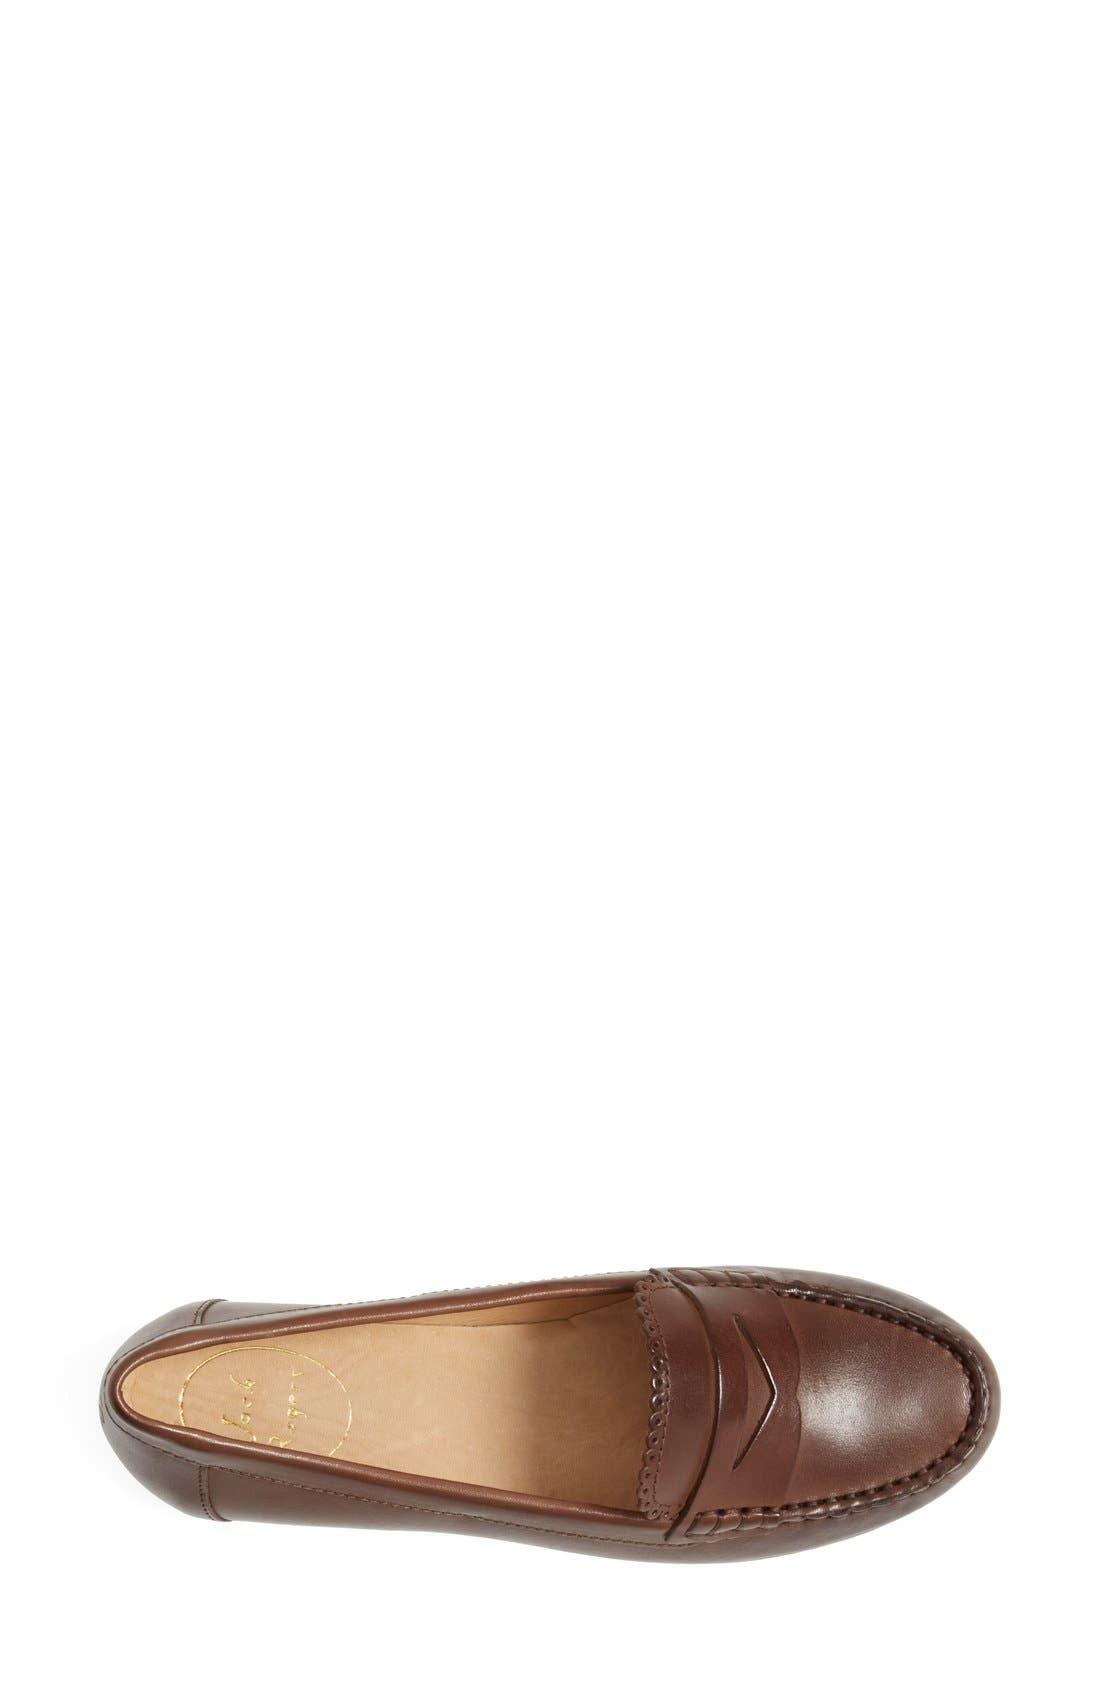 'Quinn' Leather Loafer,                             Alternate thumbnail 15, color,